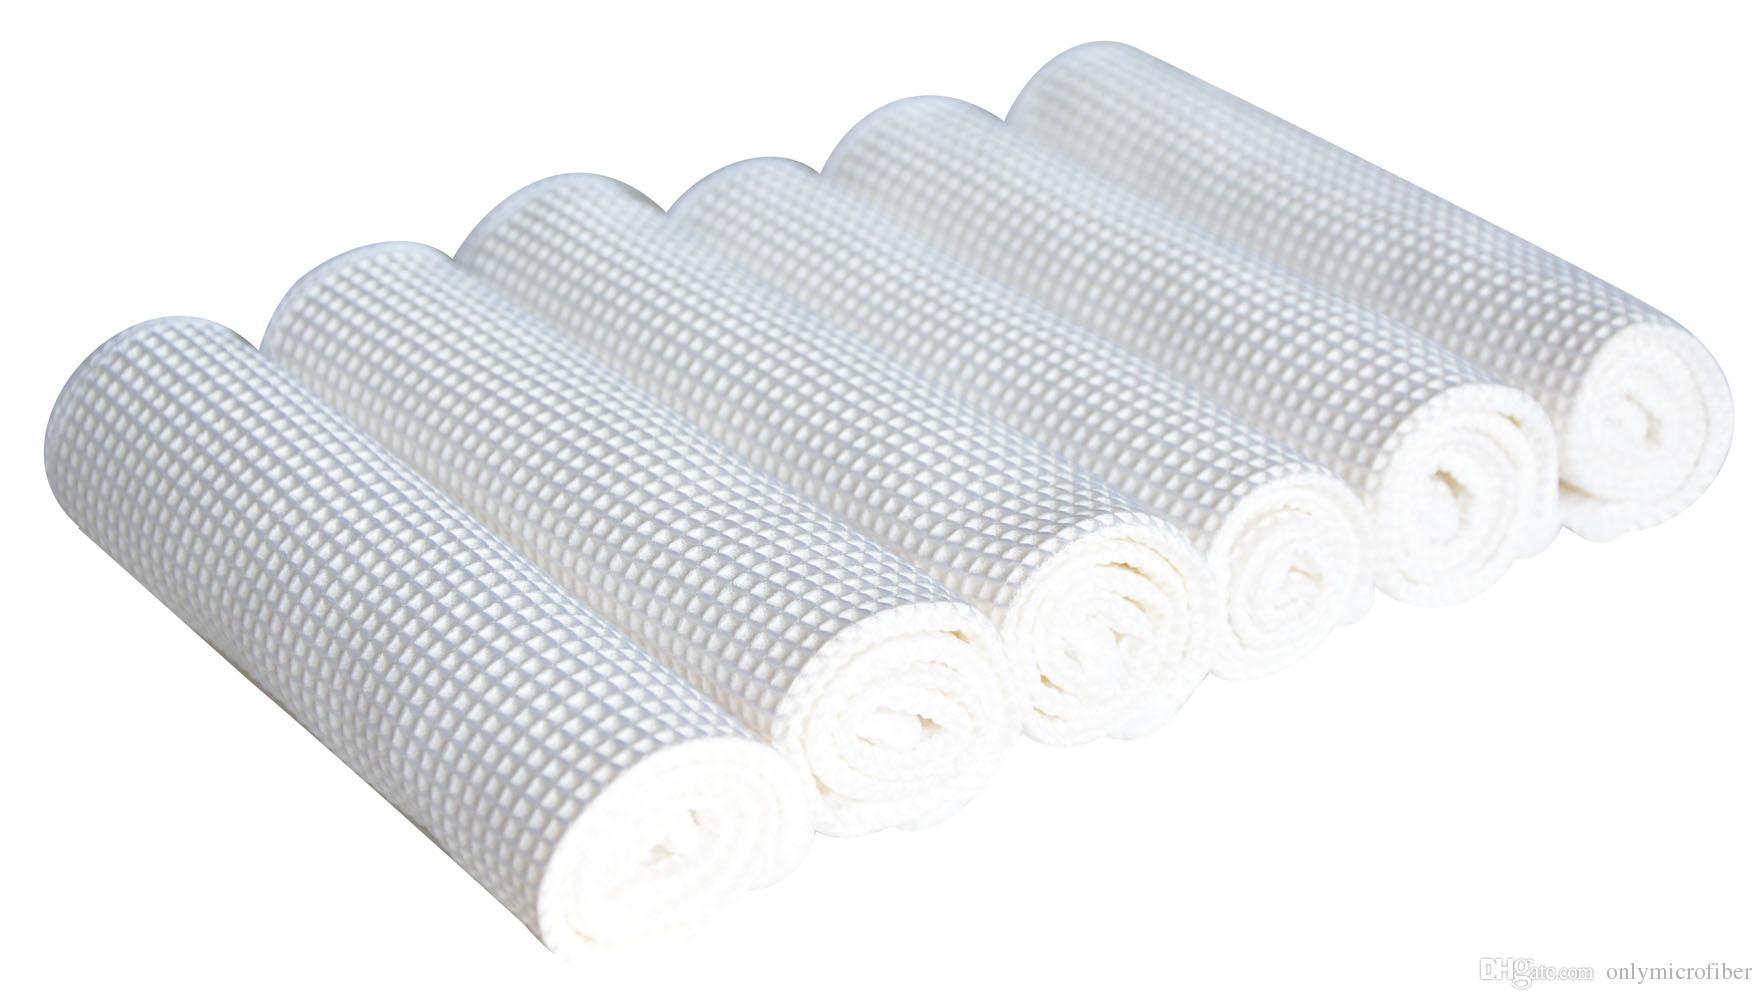 Sinland 40x60cm Microfiber Deep Waffle Weave Kitchen Towels Dishcloths  Microfibre Dish Cloth Car Detailing Cloths Decorative Hand Towels Hooded  Bath Towels ...